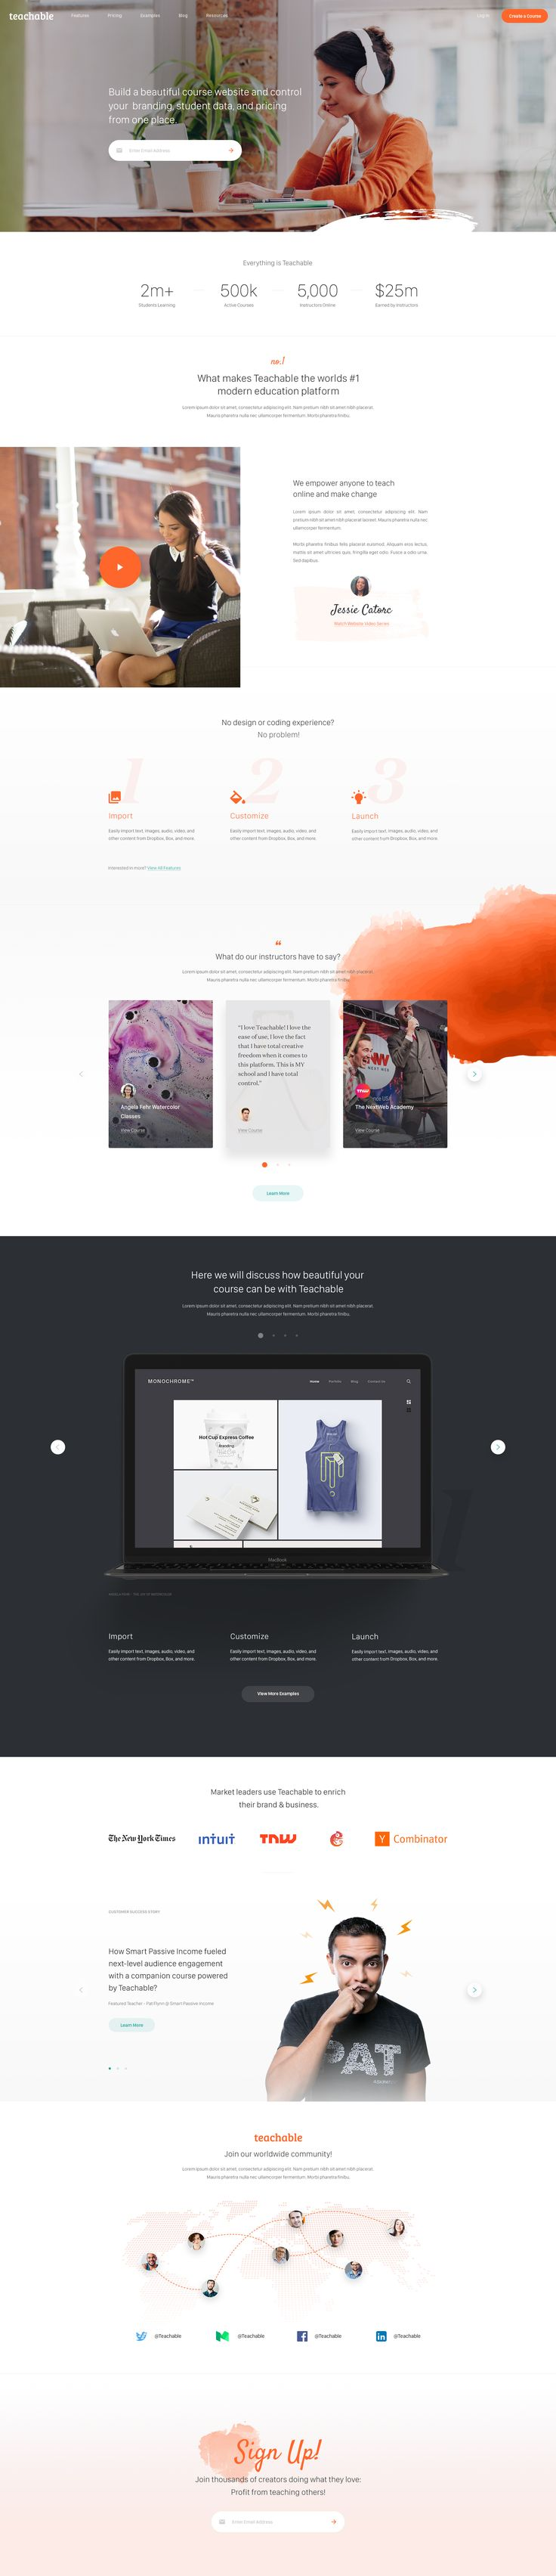 Teachable - Homepage Design